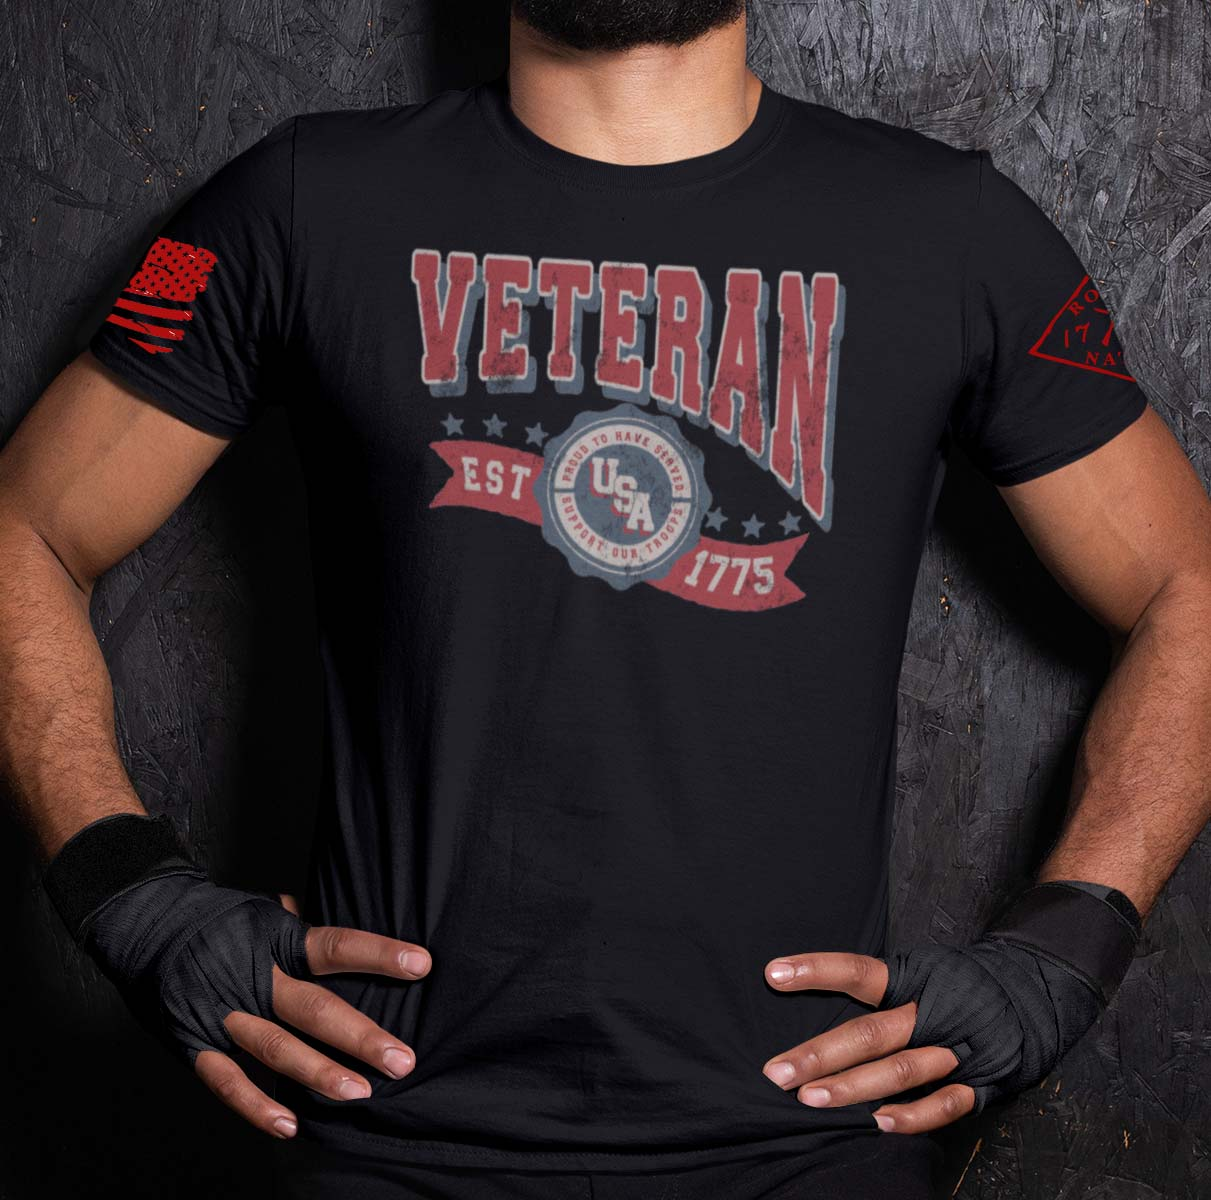 Veteran in the USA on a Black T-Shirt Men's